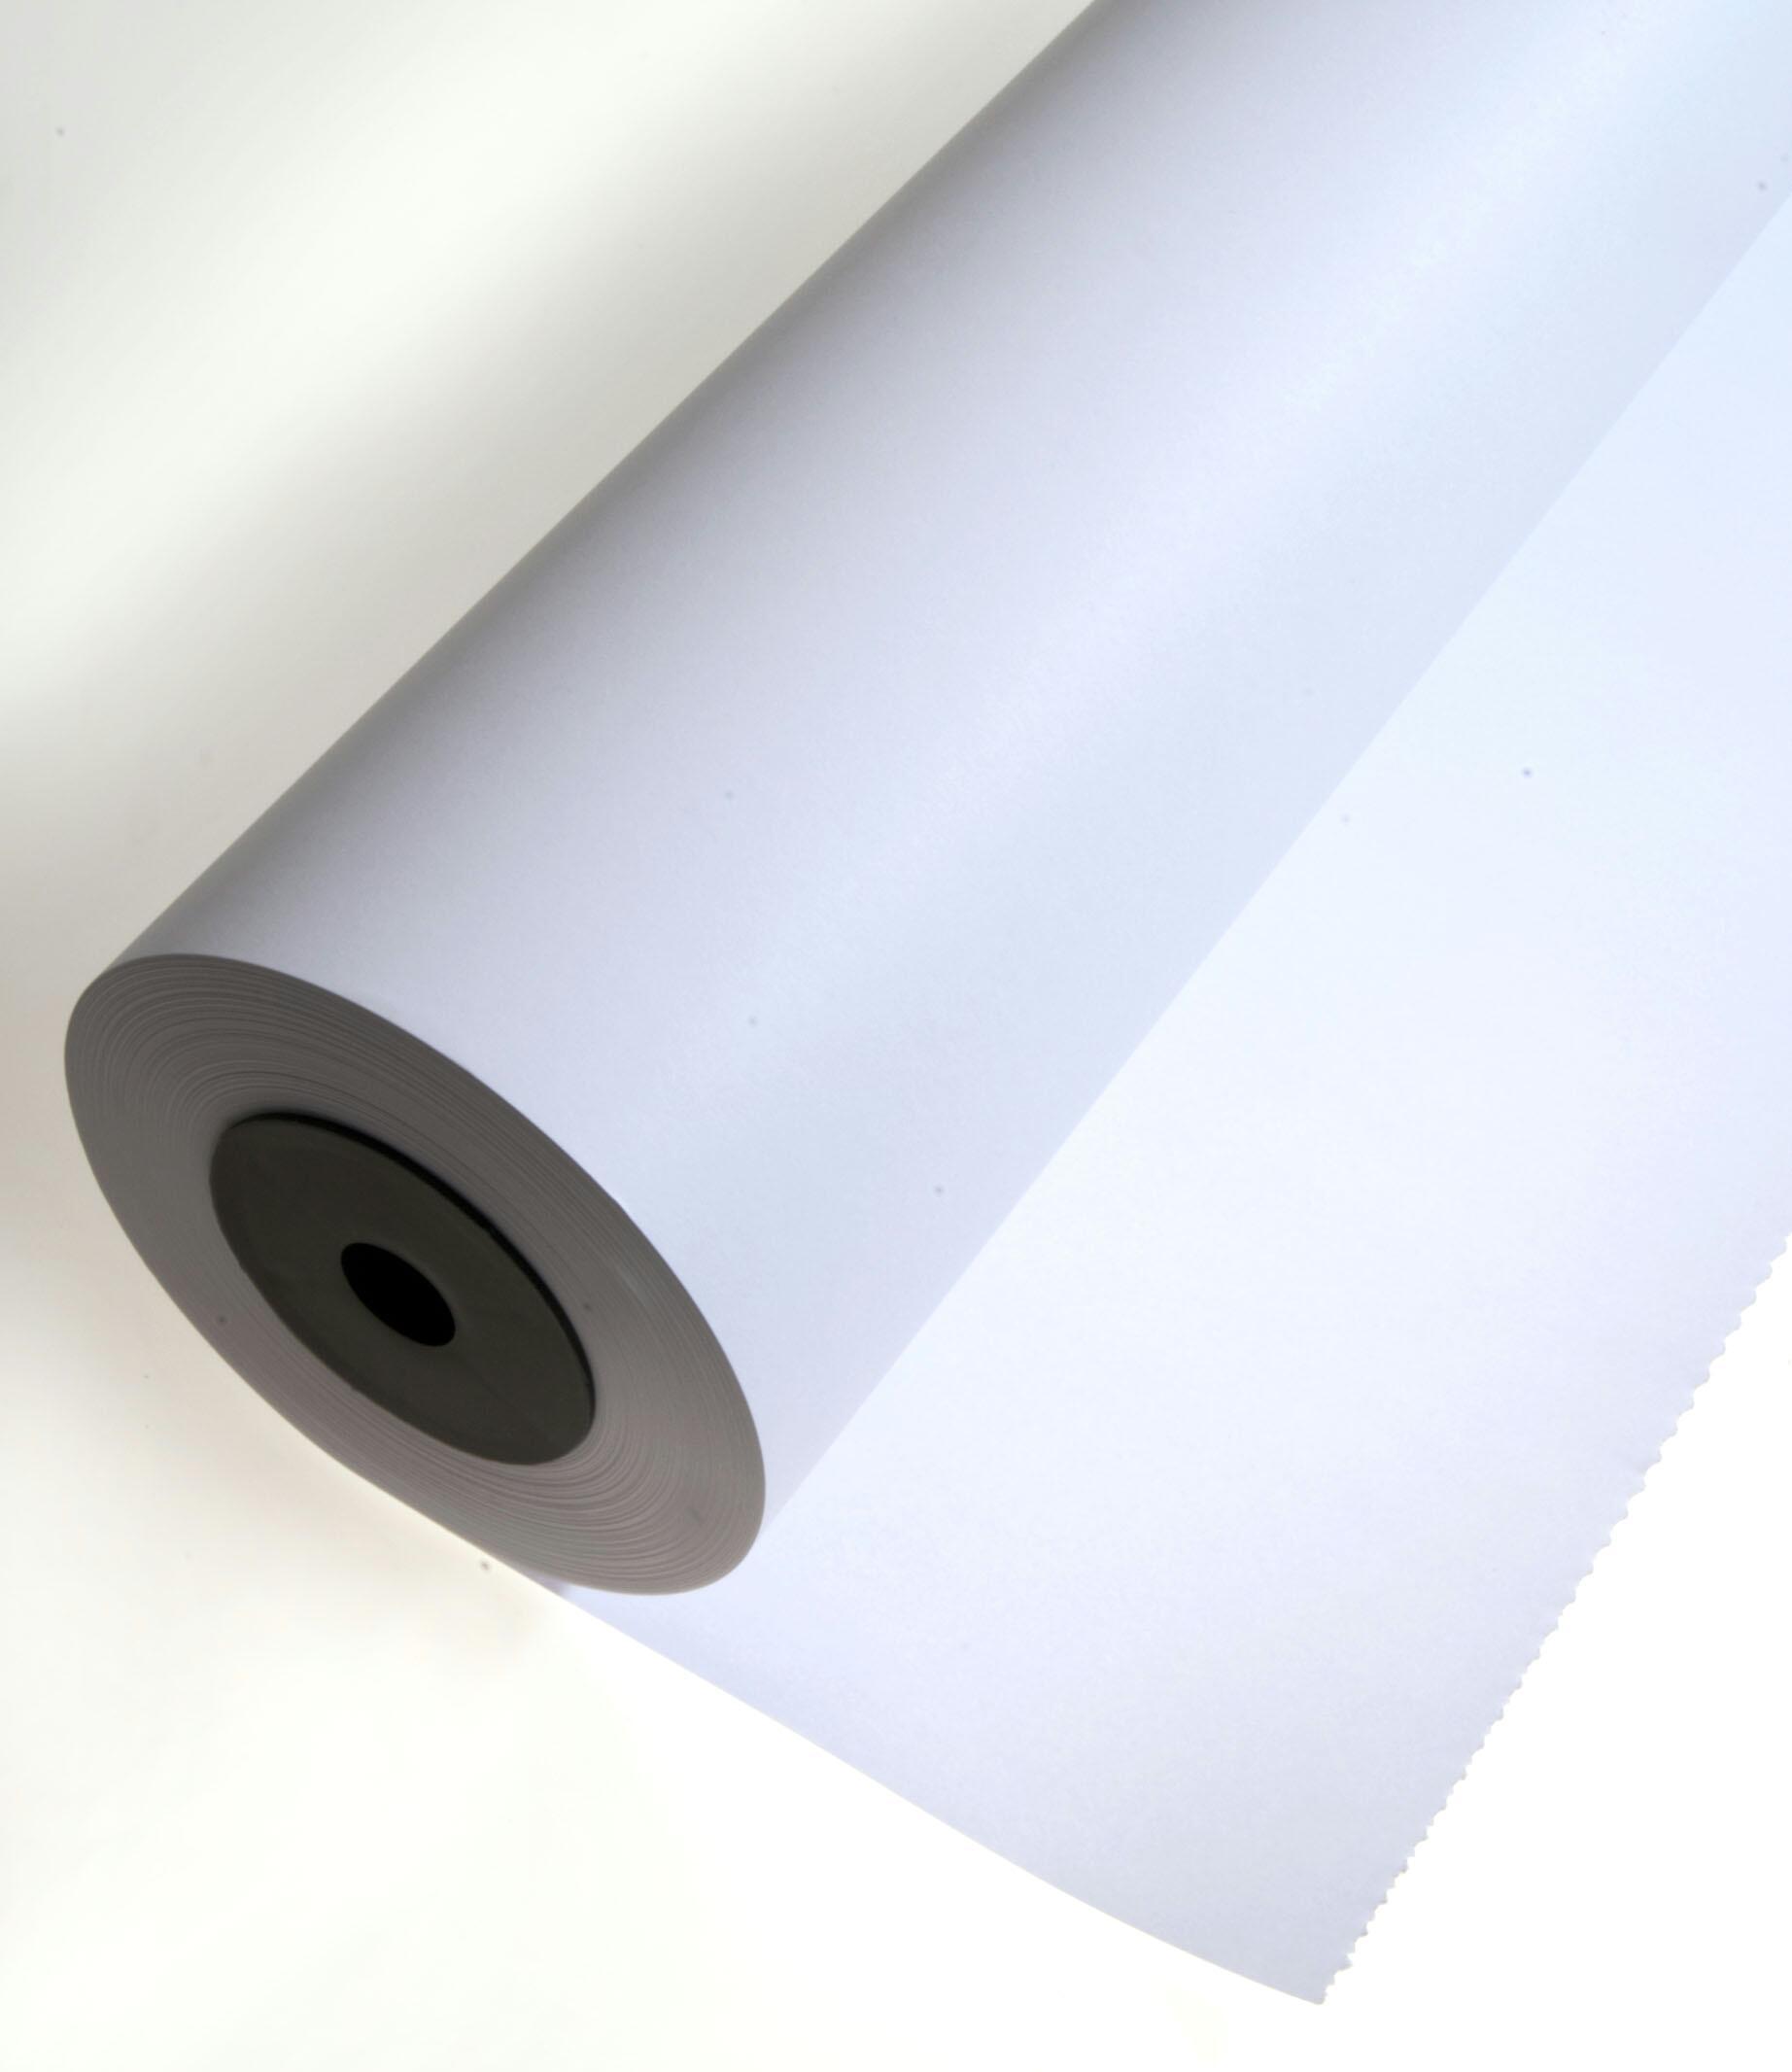 papier f r schnittmuster schnittpapier wei 120g 90cm ca 95 lfm schneiderpuppen. Black Bedroom Furniture Sets. Home Design Ideas